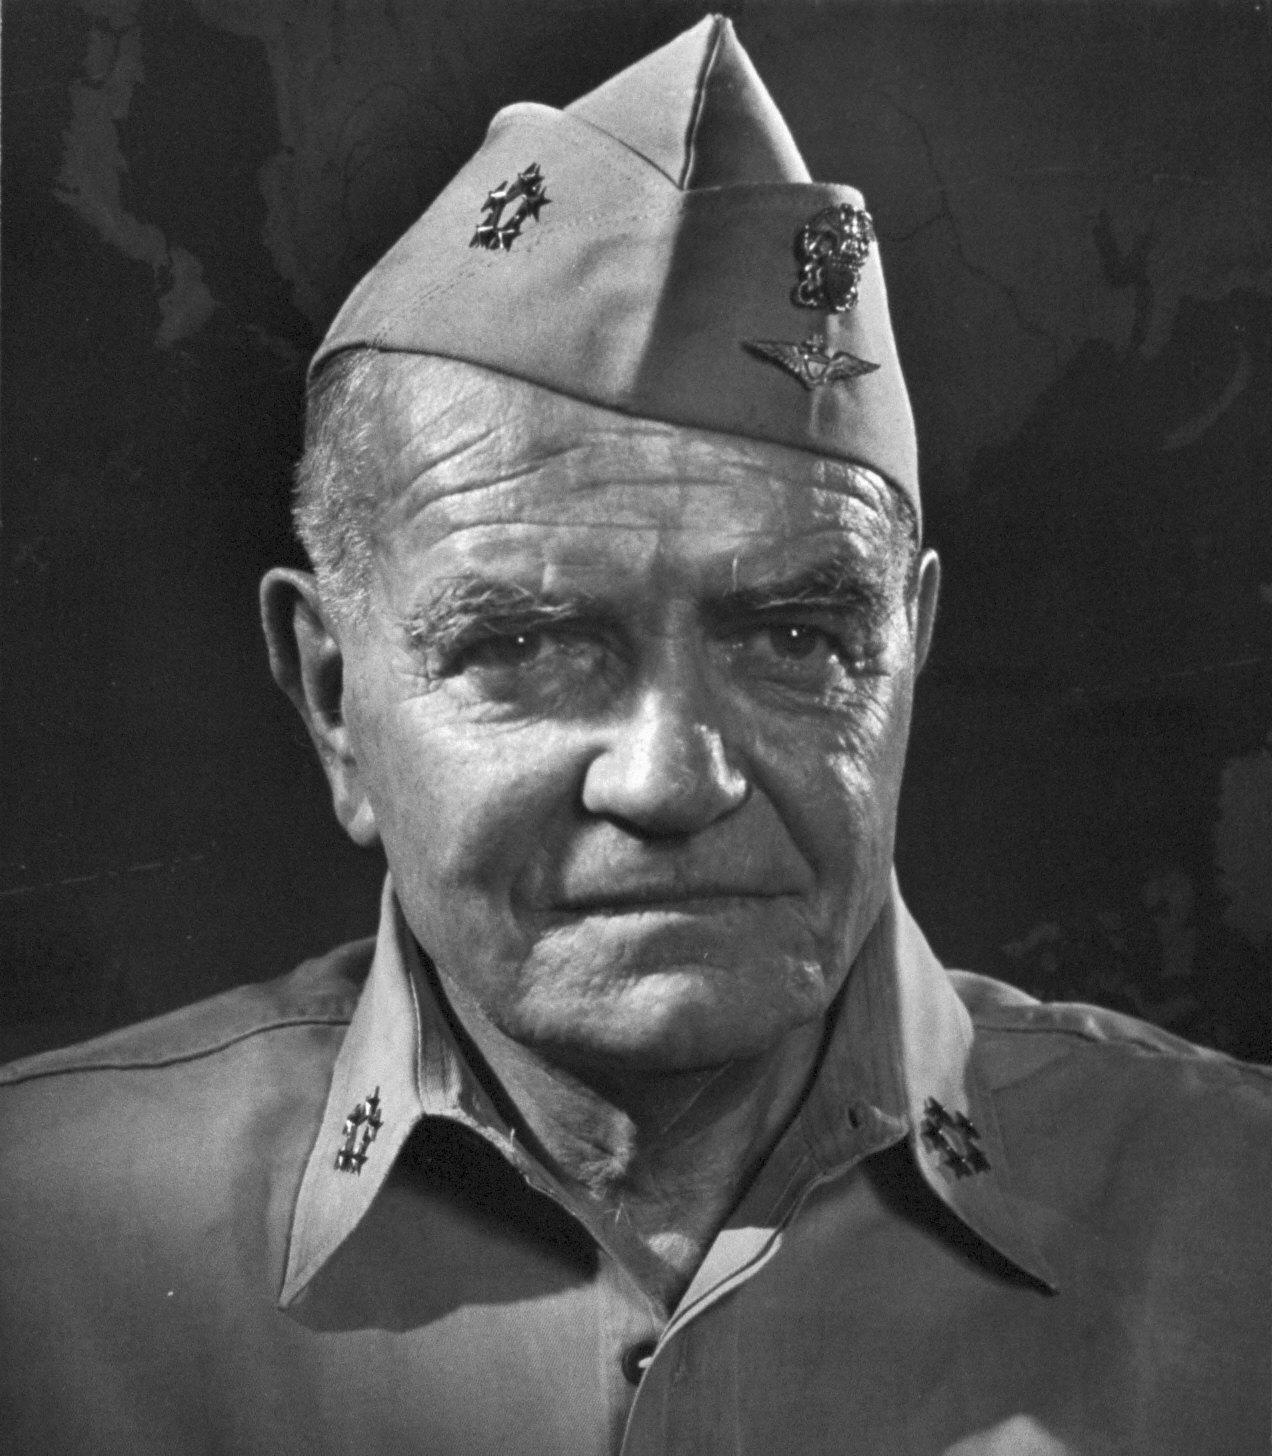 Admiral Halsey